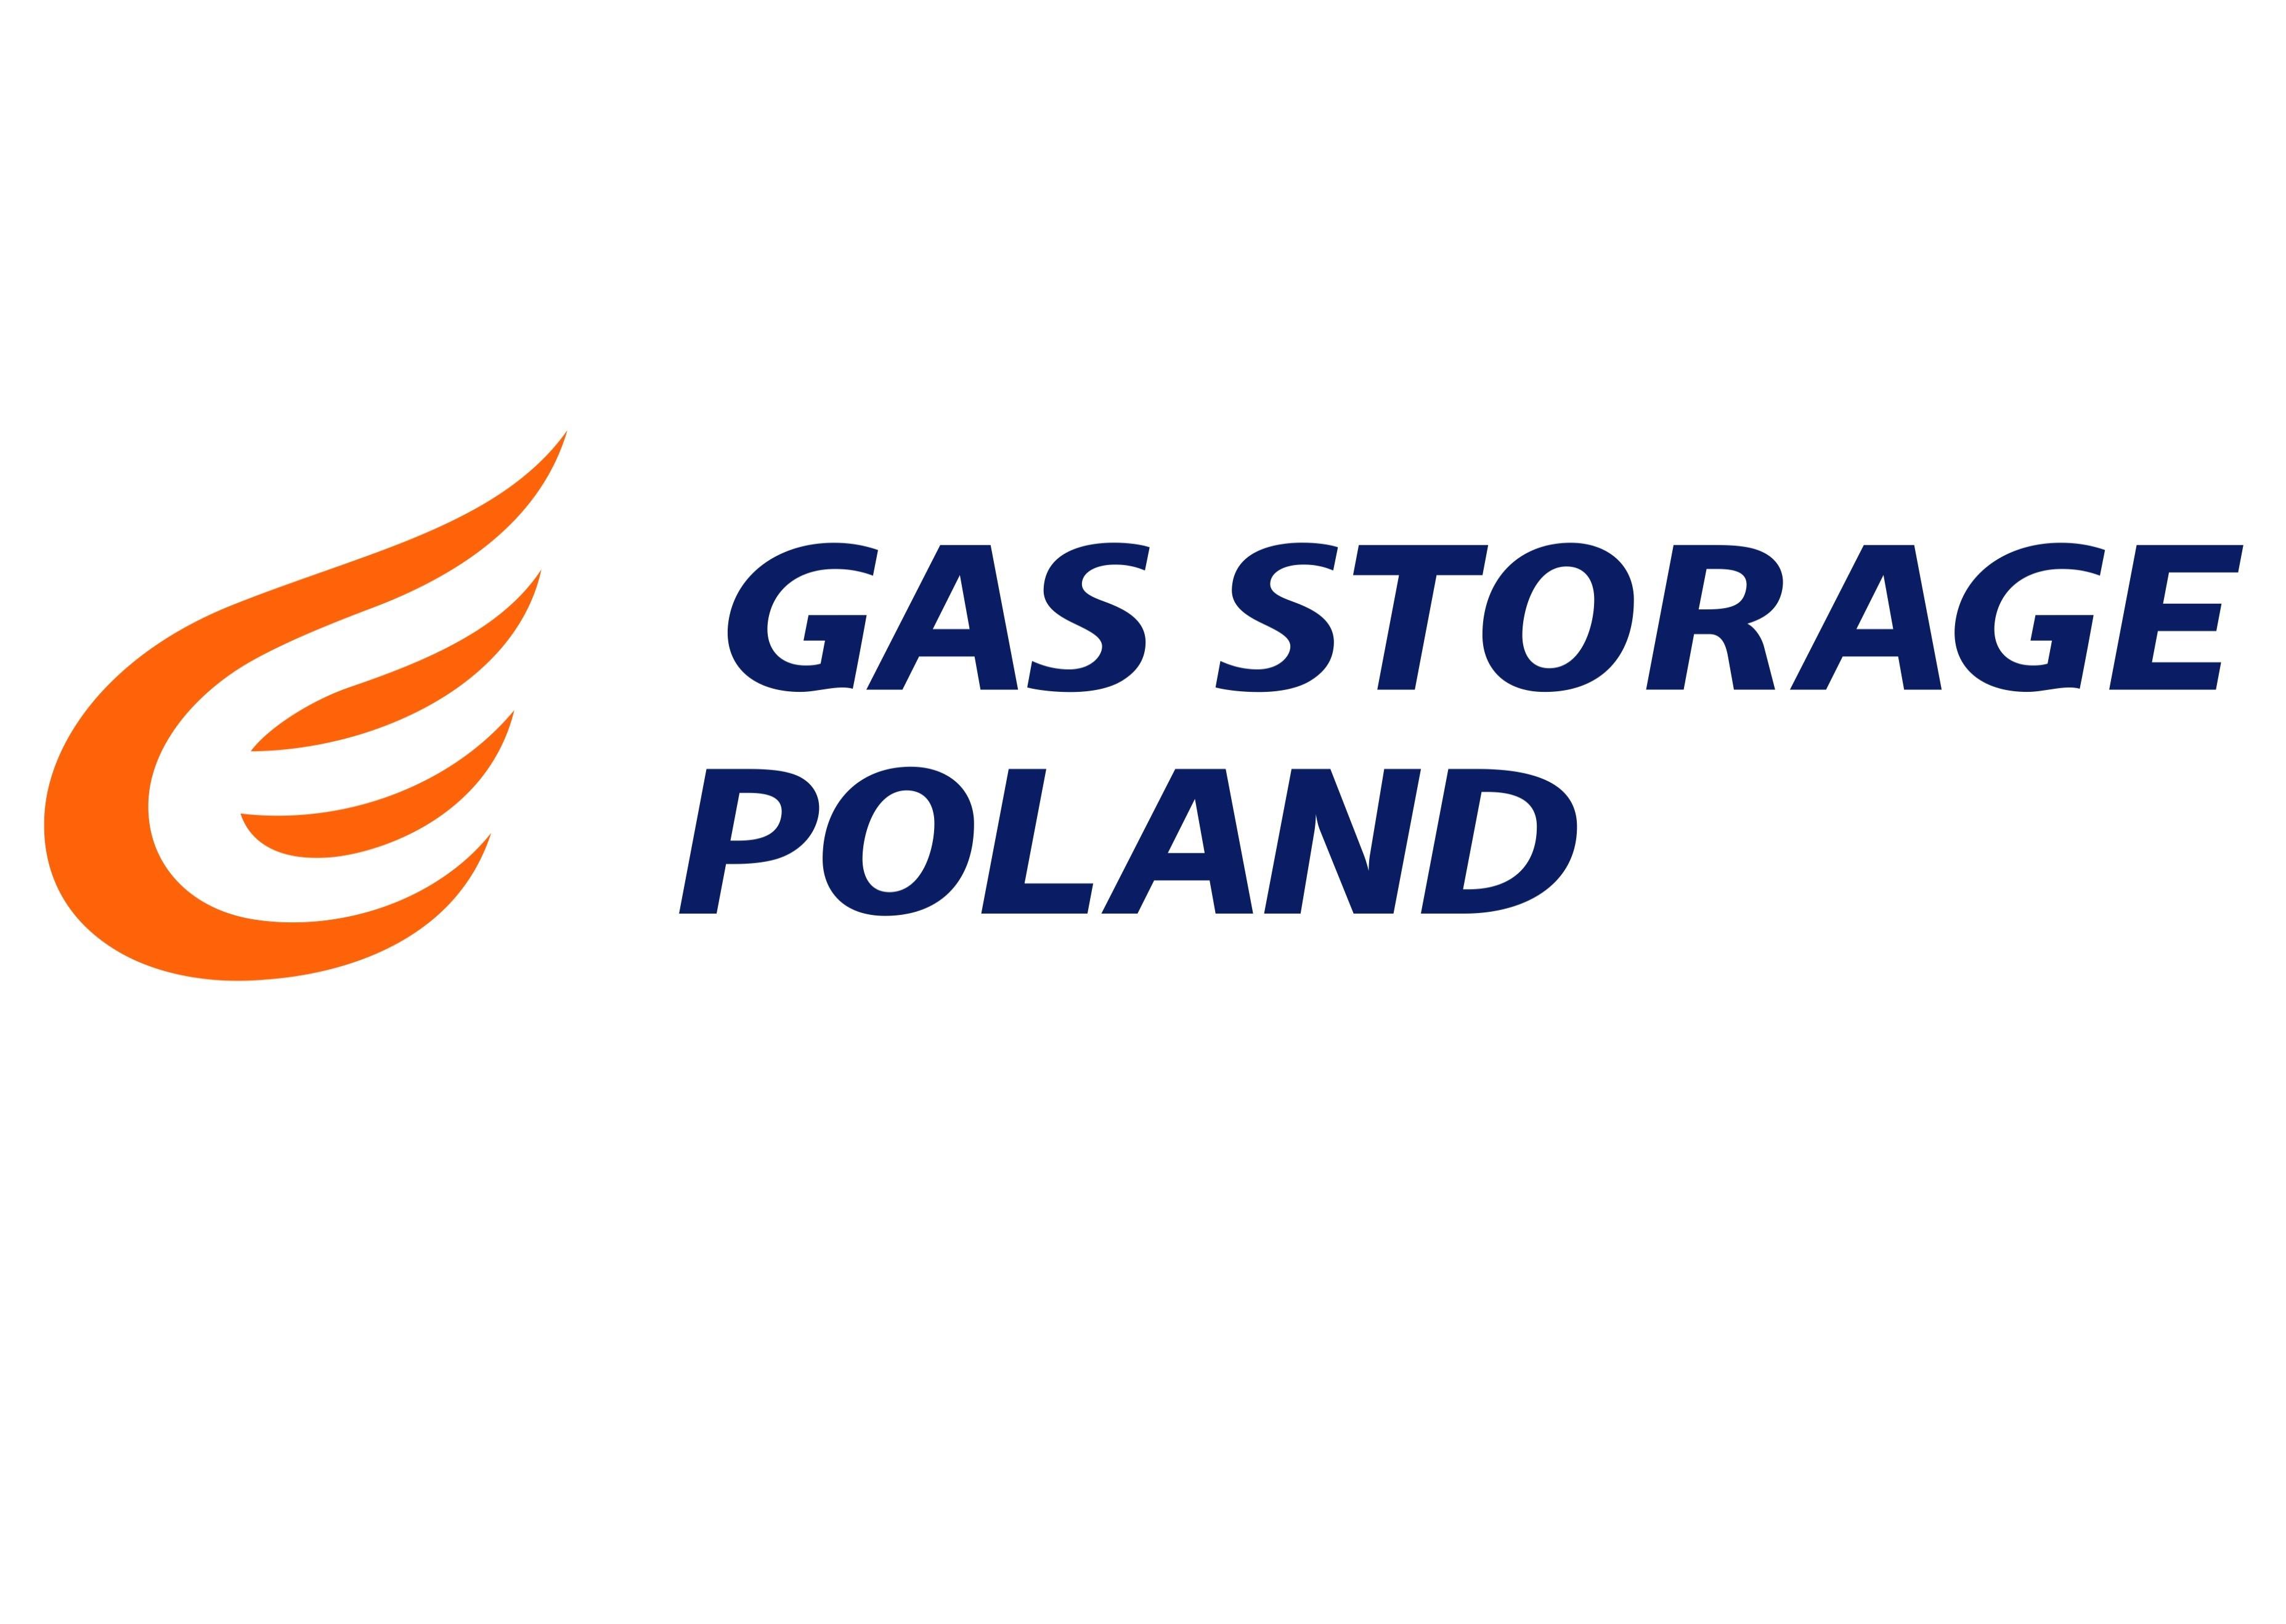 Gas Storage Poland